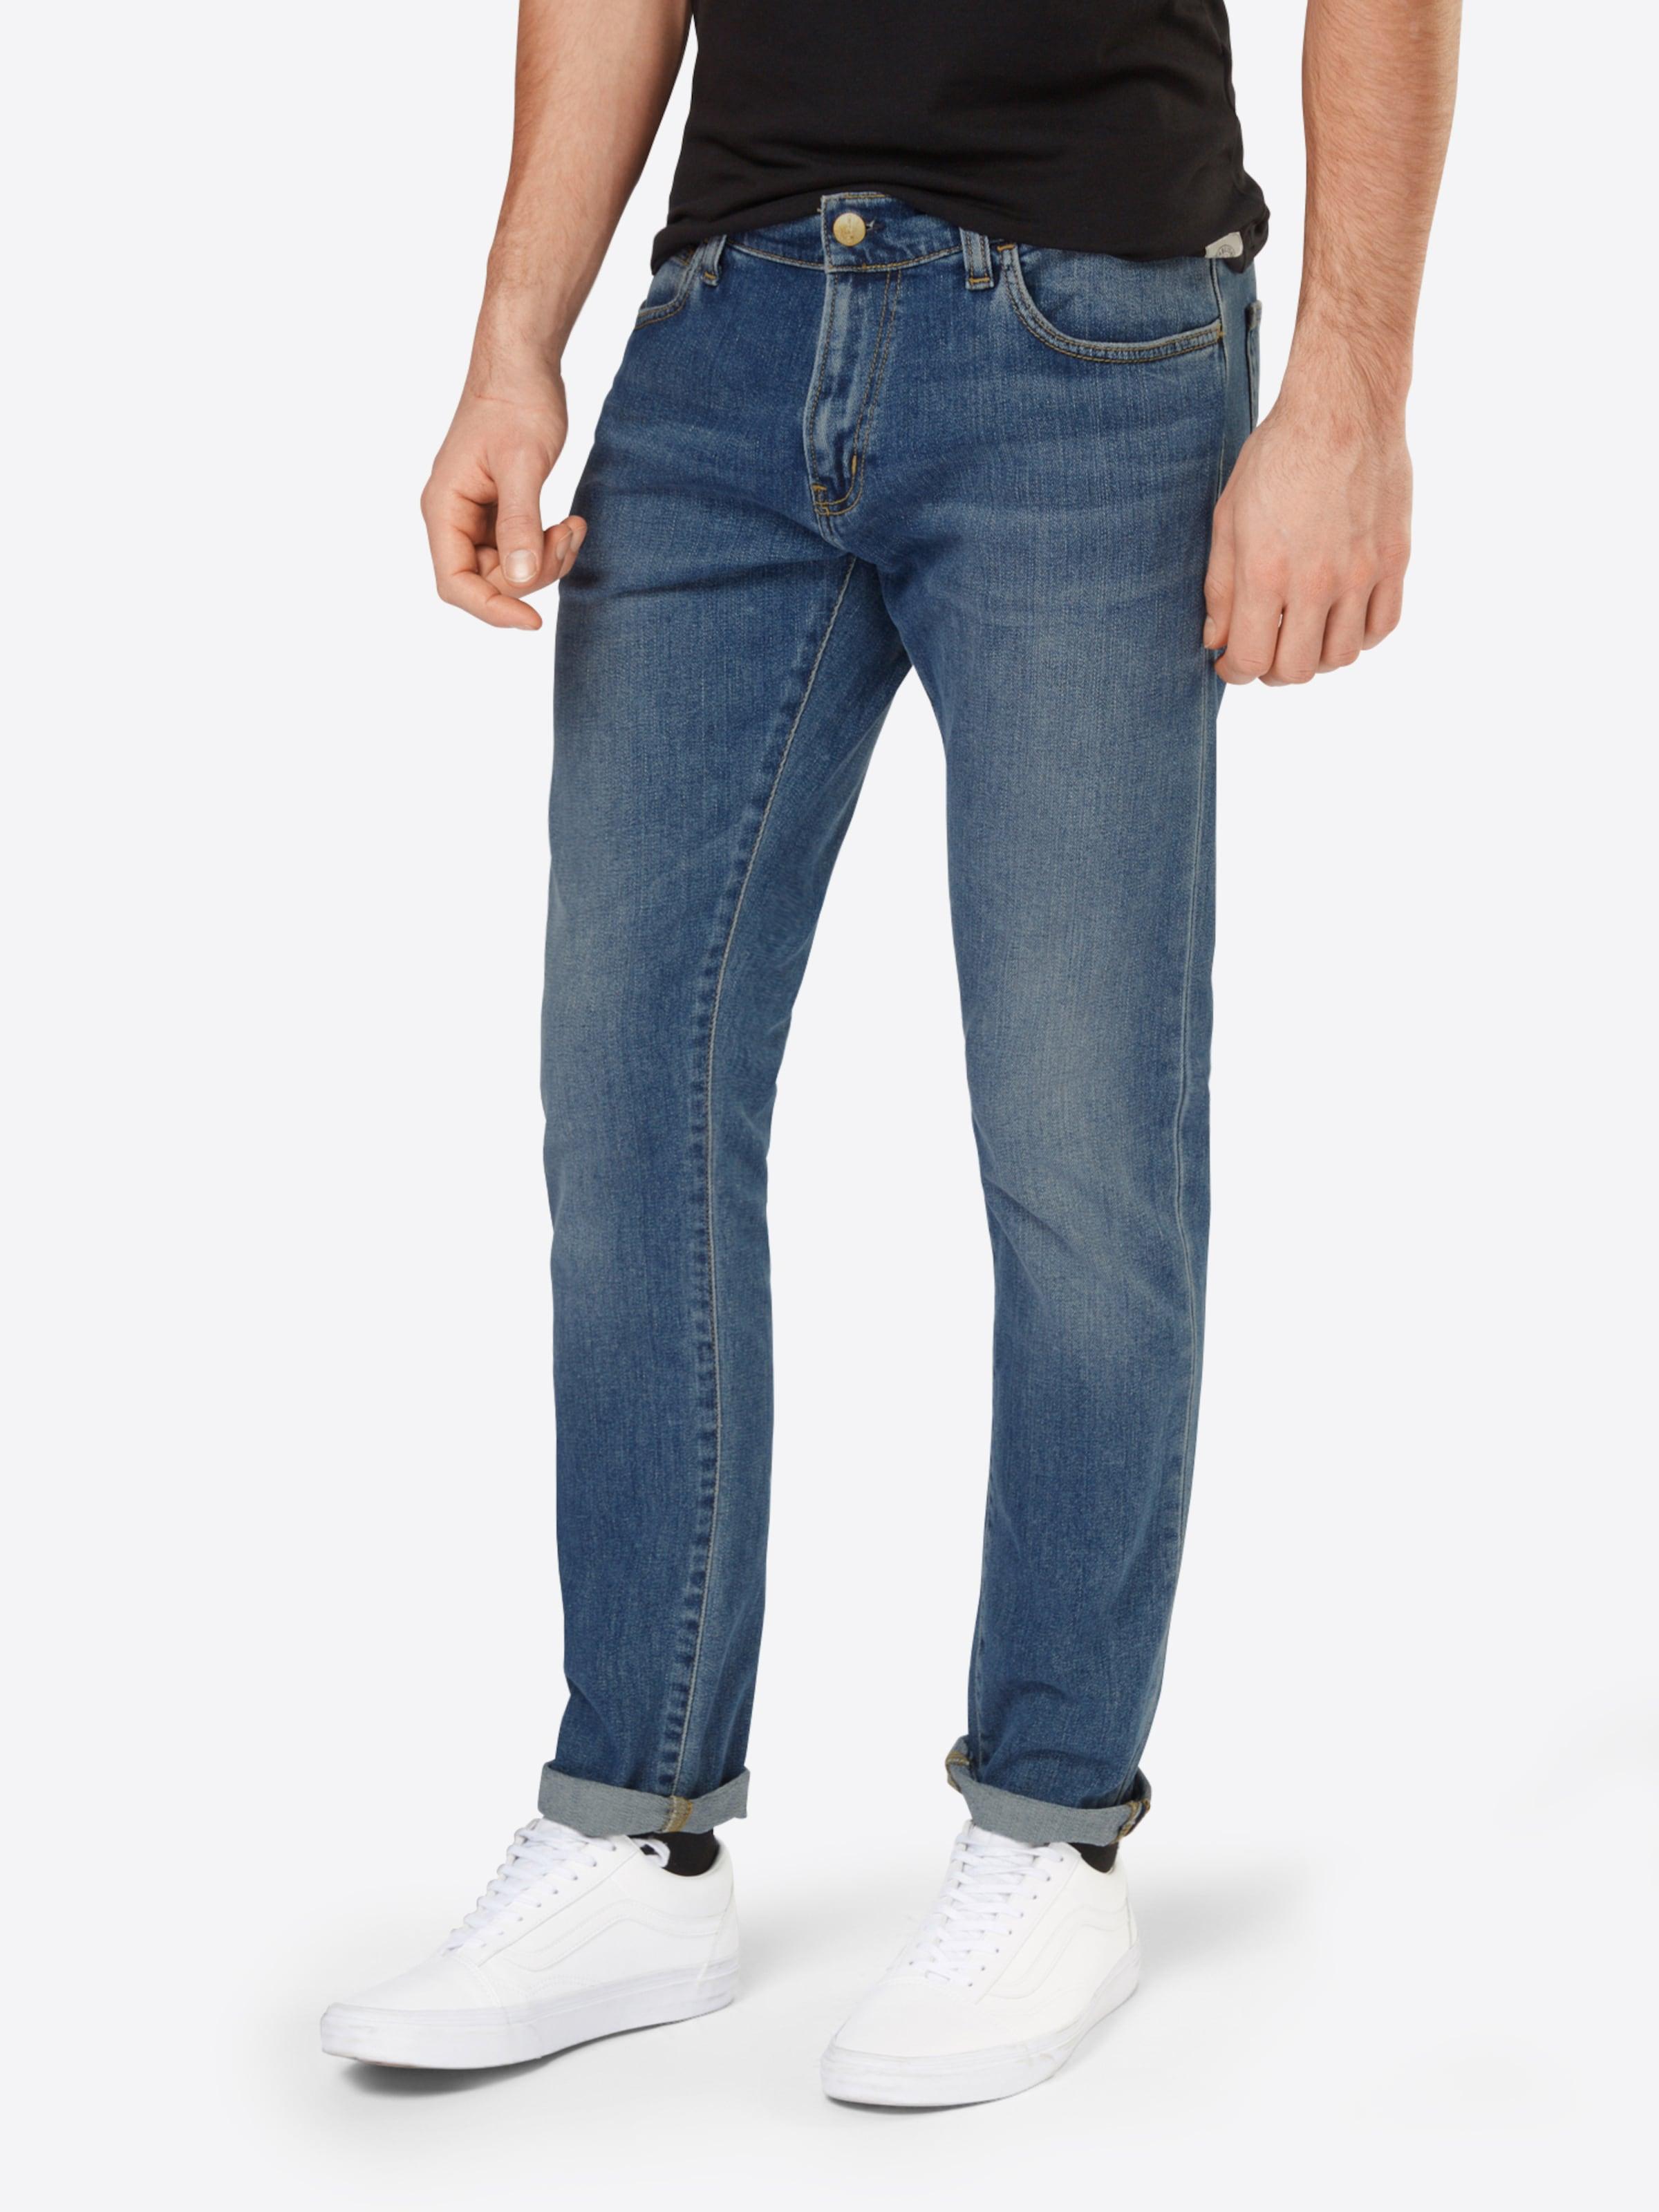 Carhartt WIP Jeans 'Rebel Pant' Spielraum Echt Viele Arten es3PmK1Rp0